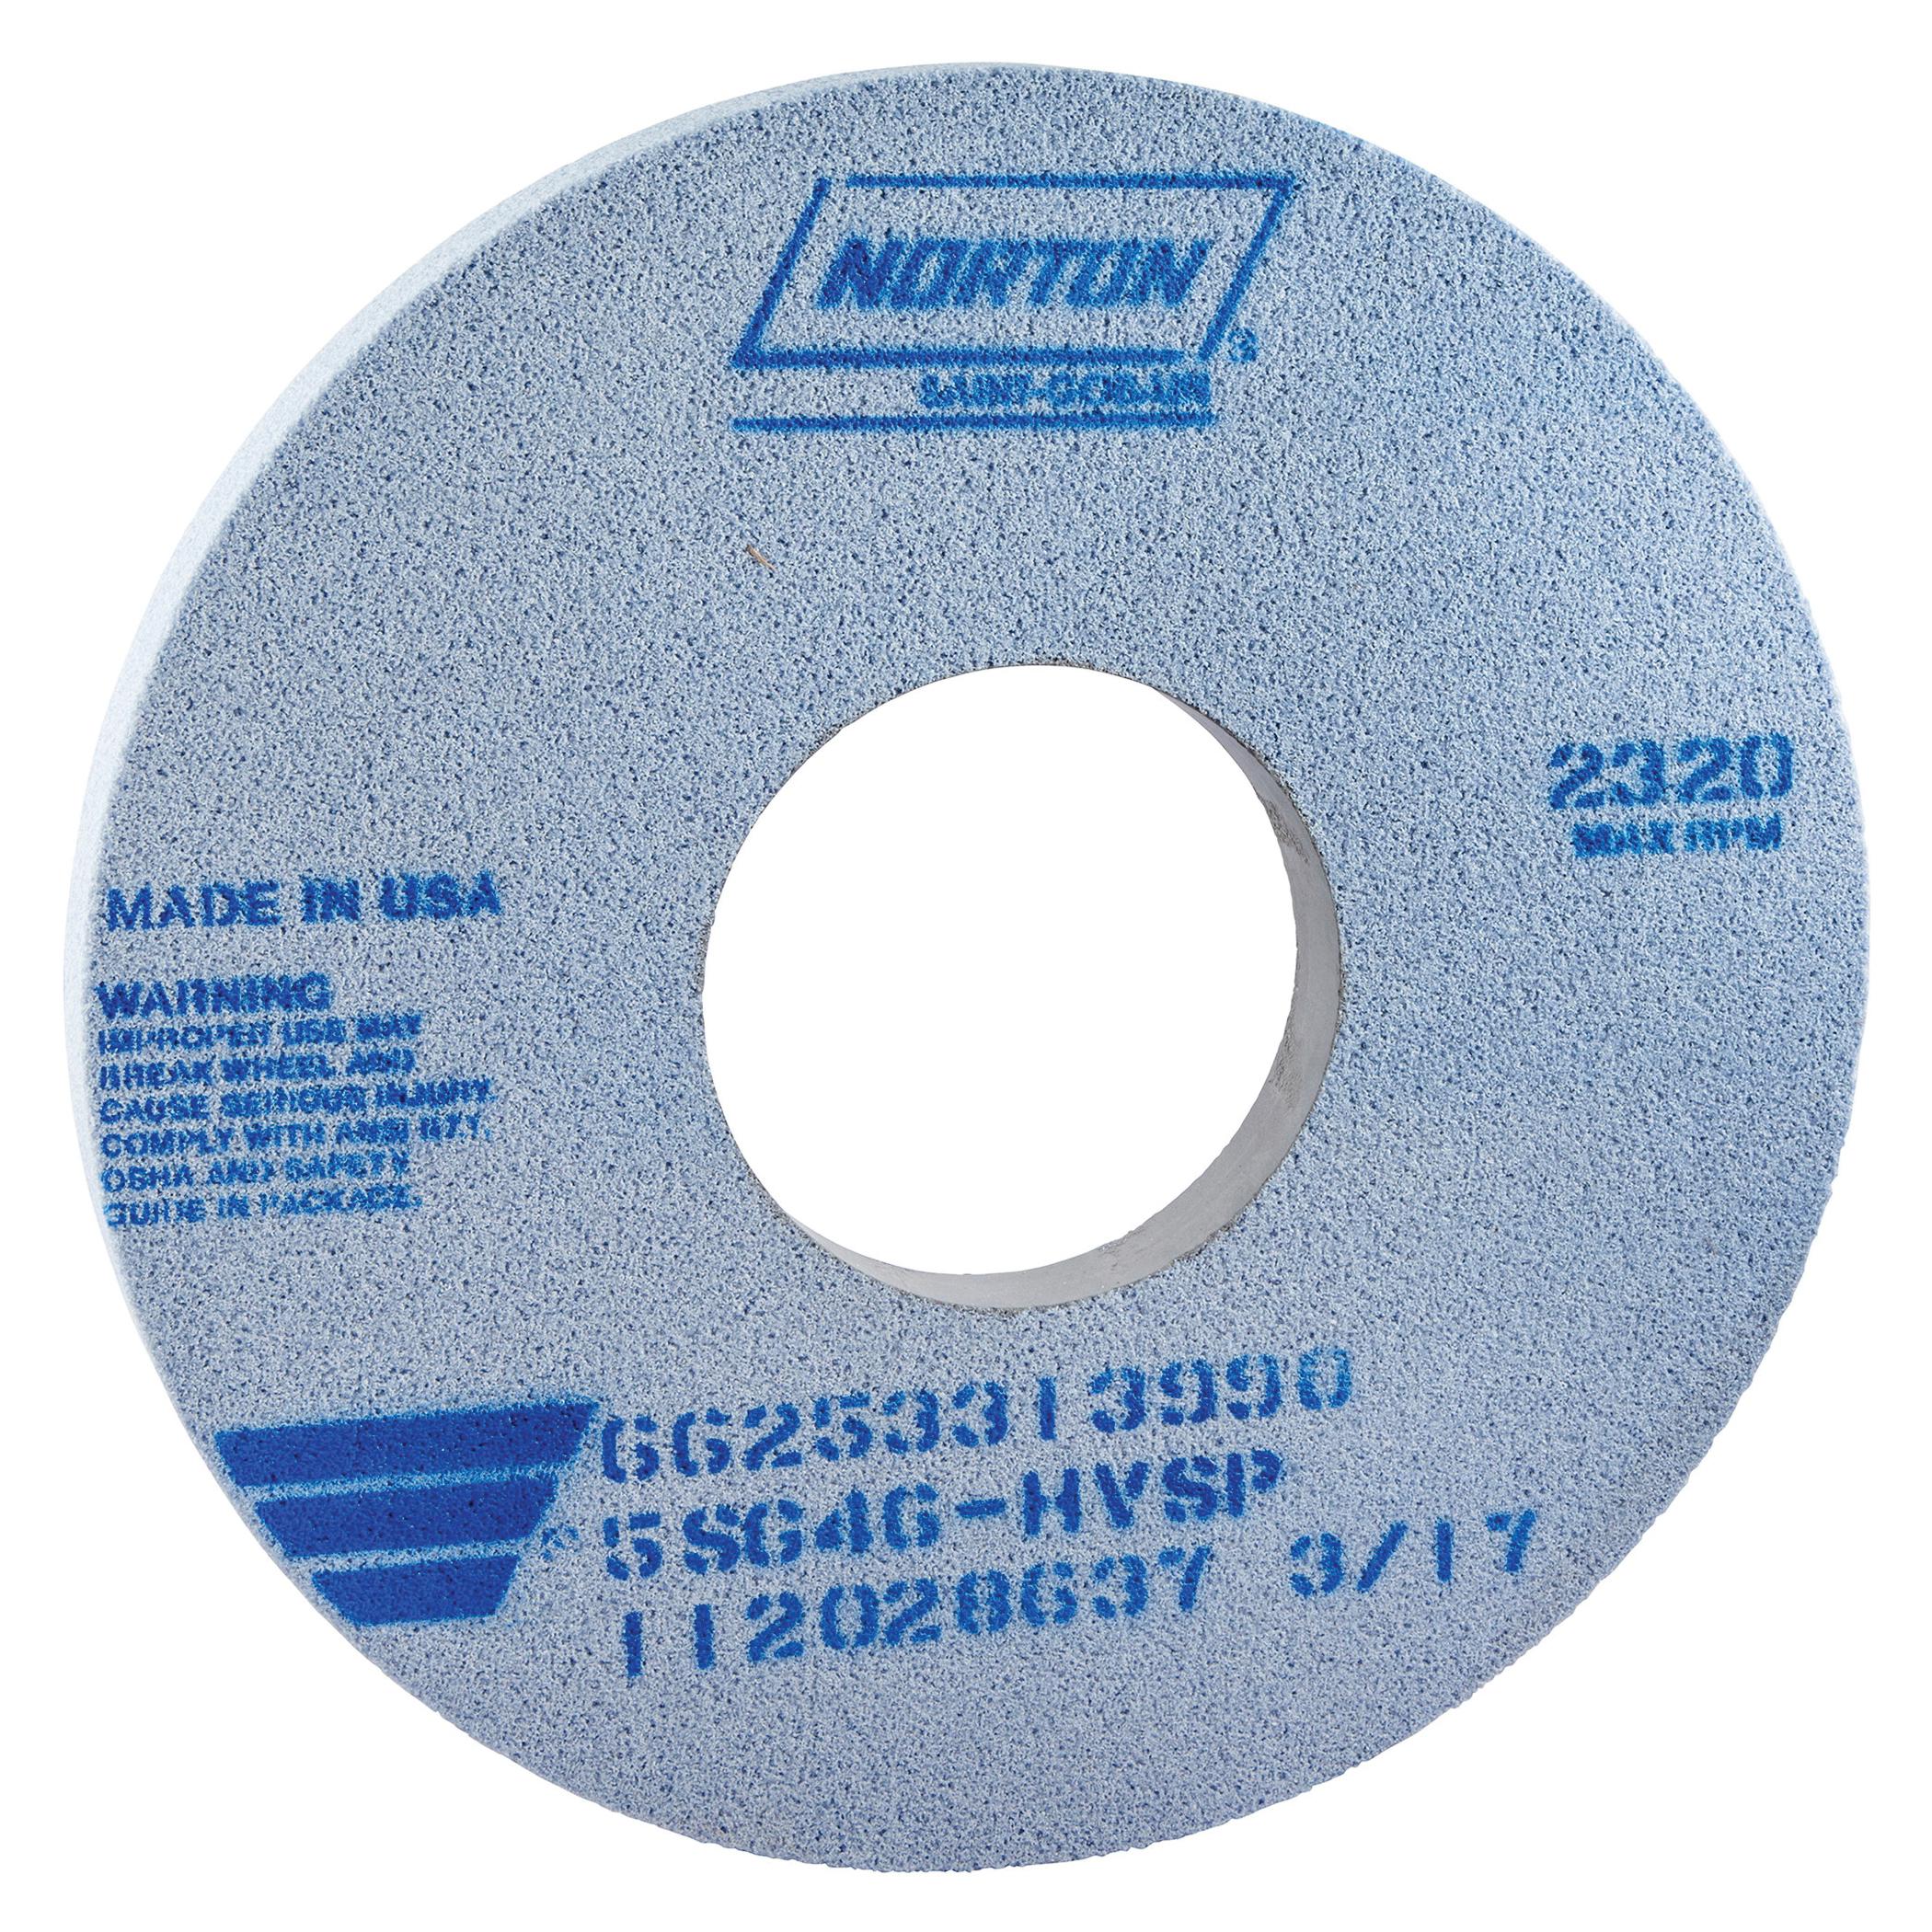 Norton® 66253313990 5SG Straight Toolroom Wheel, 14 in Dia x 1 in THK, 5 in Center Hole, 46 Grit, Ceramic Alumina/Friable Aluminum Oxide Abrasive